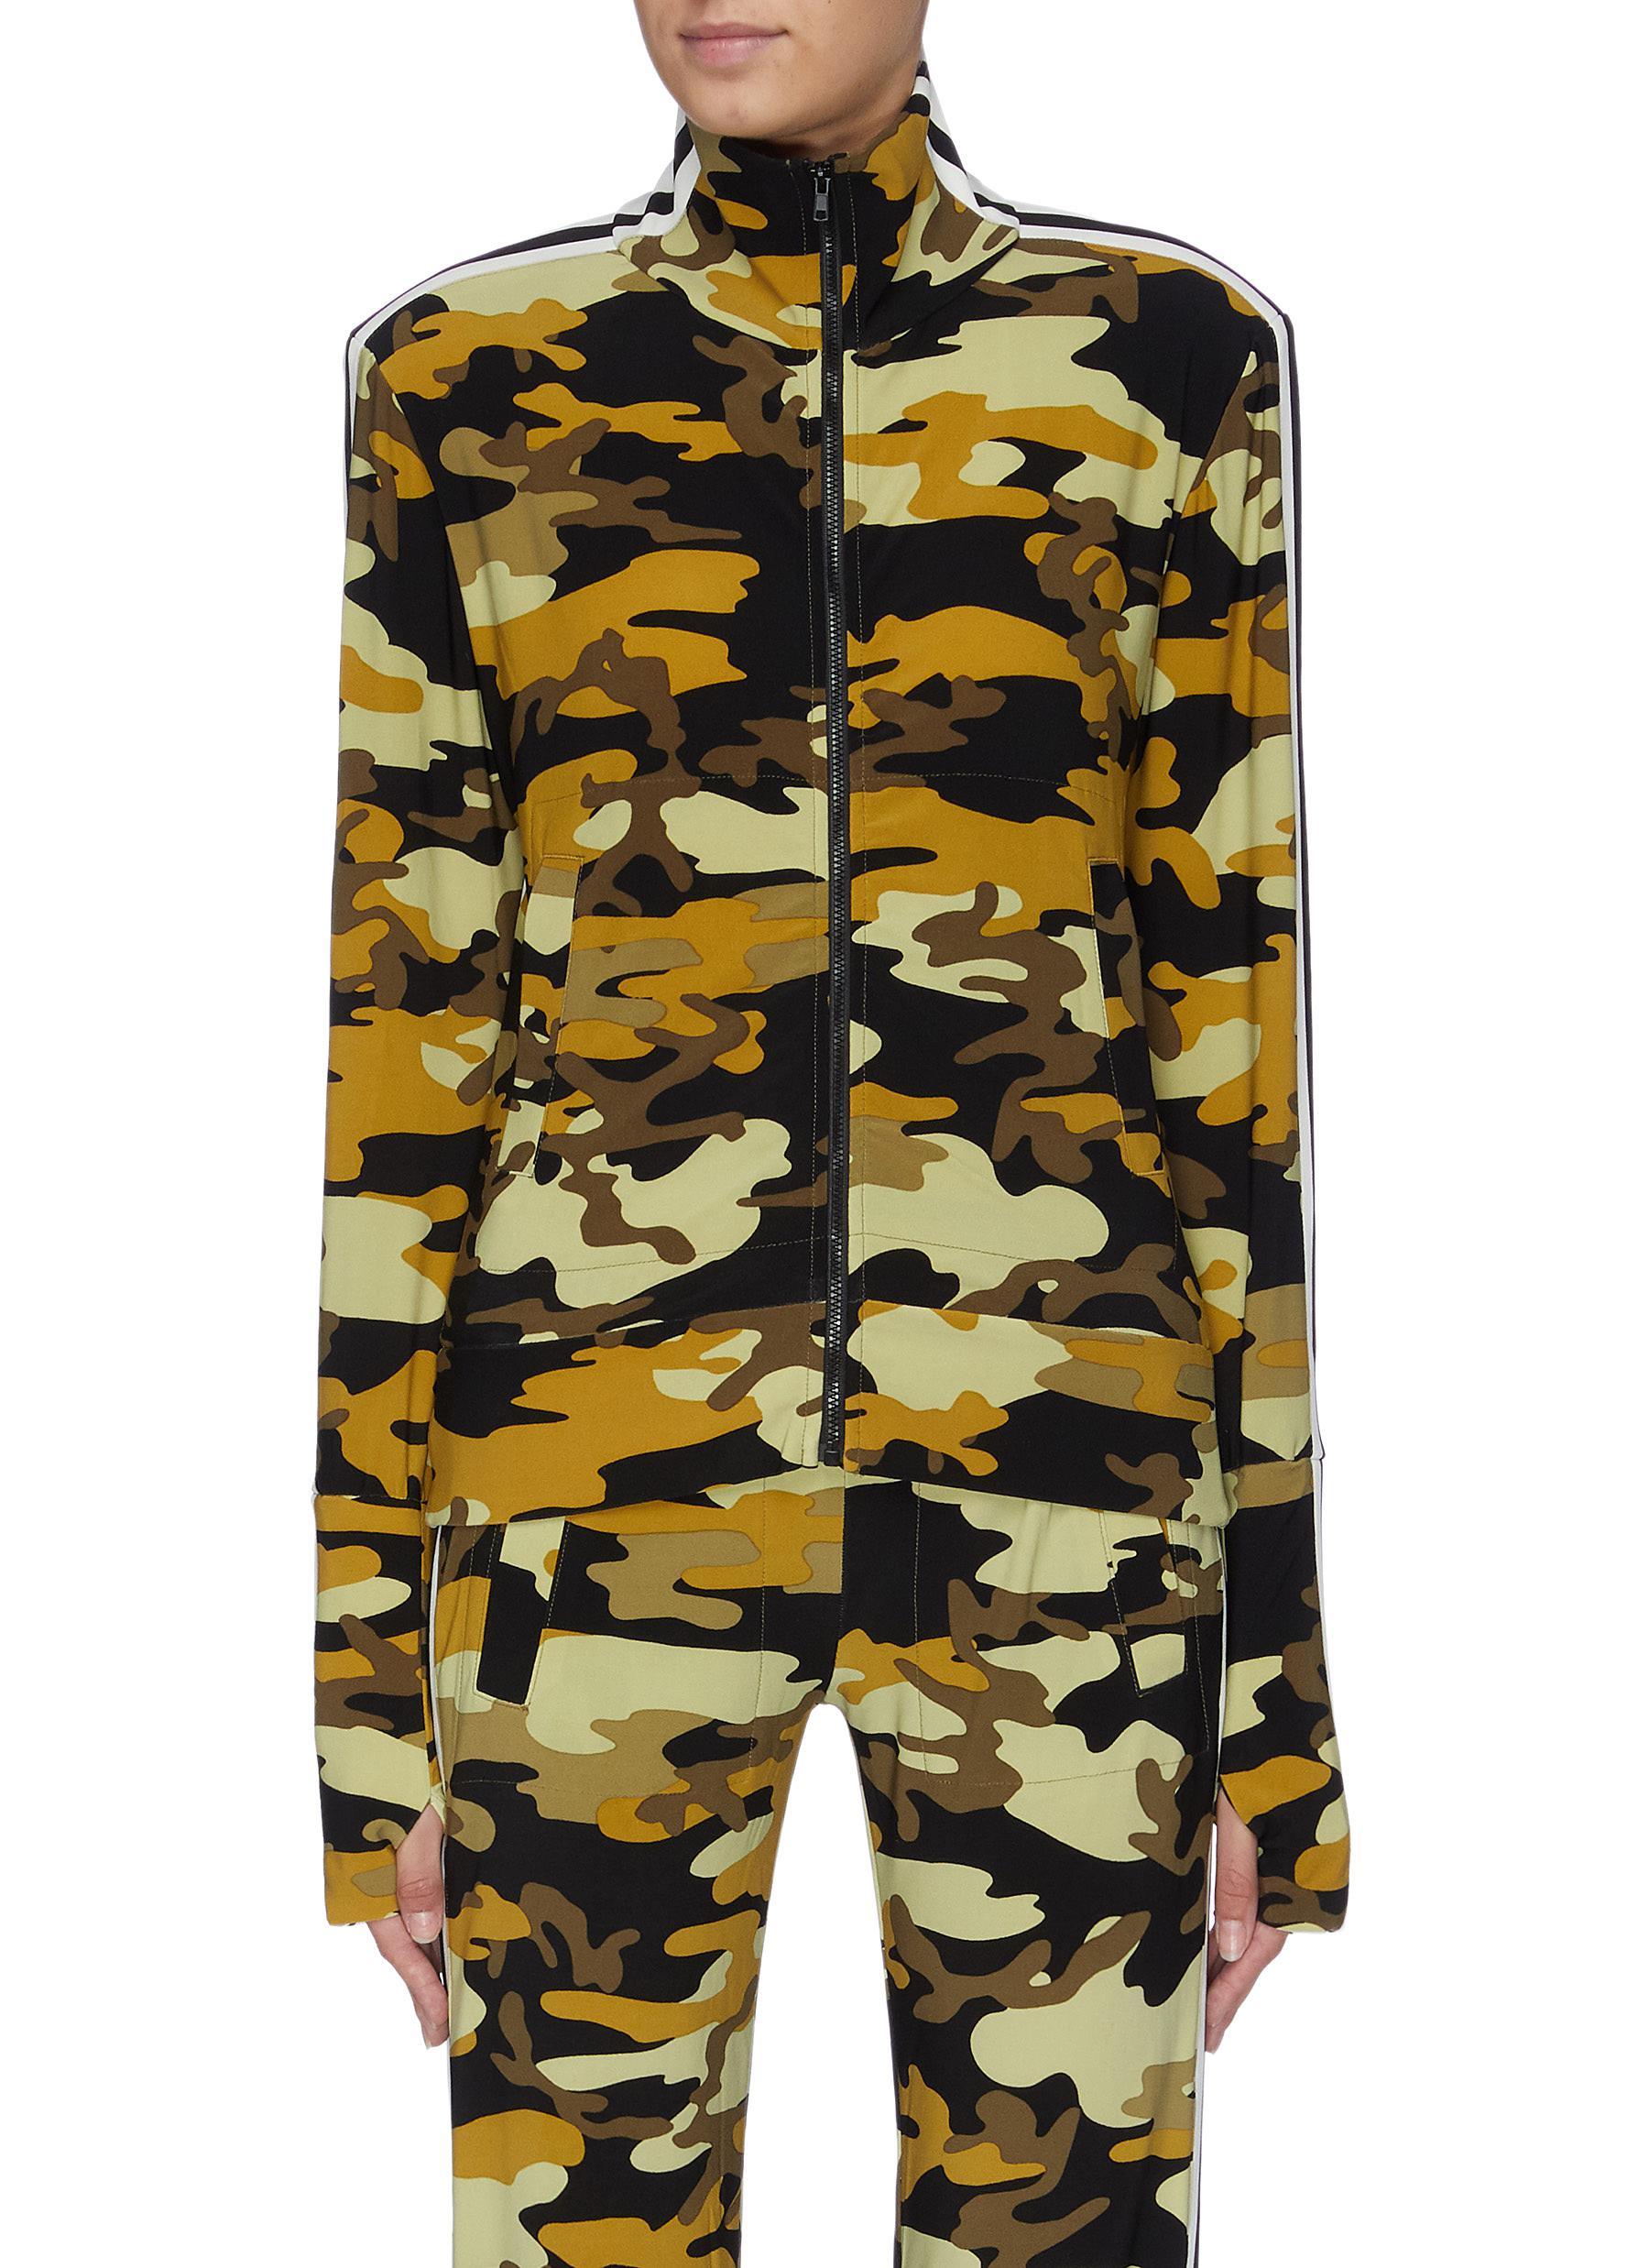 Stripe sleeve camoflage print turtleneck track jacket by Norma Kamali